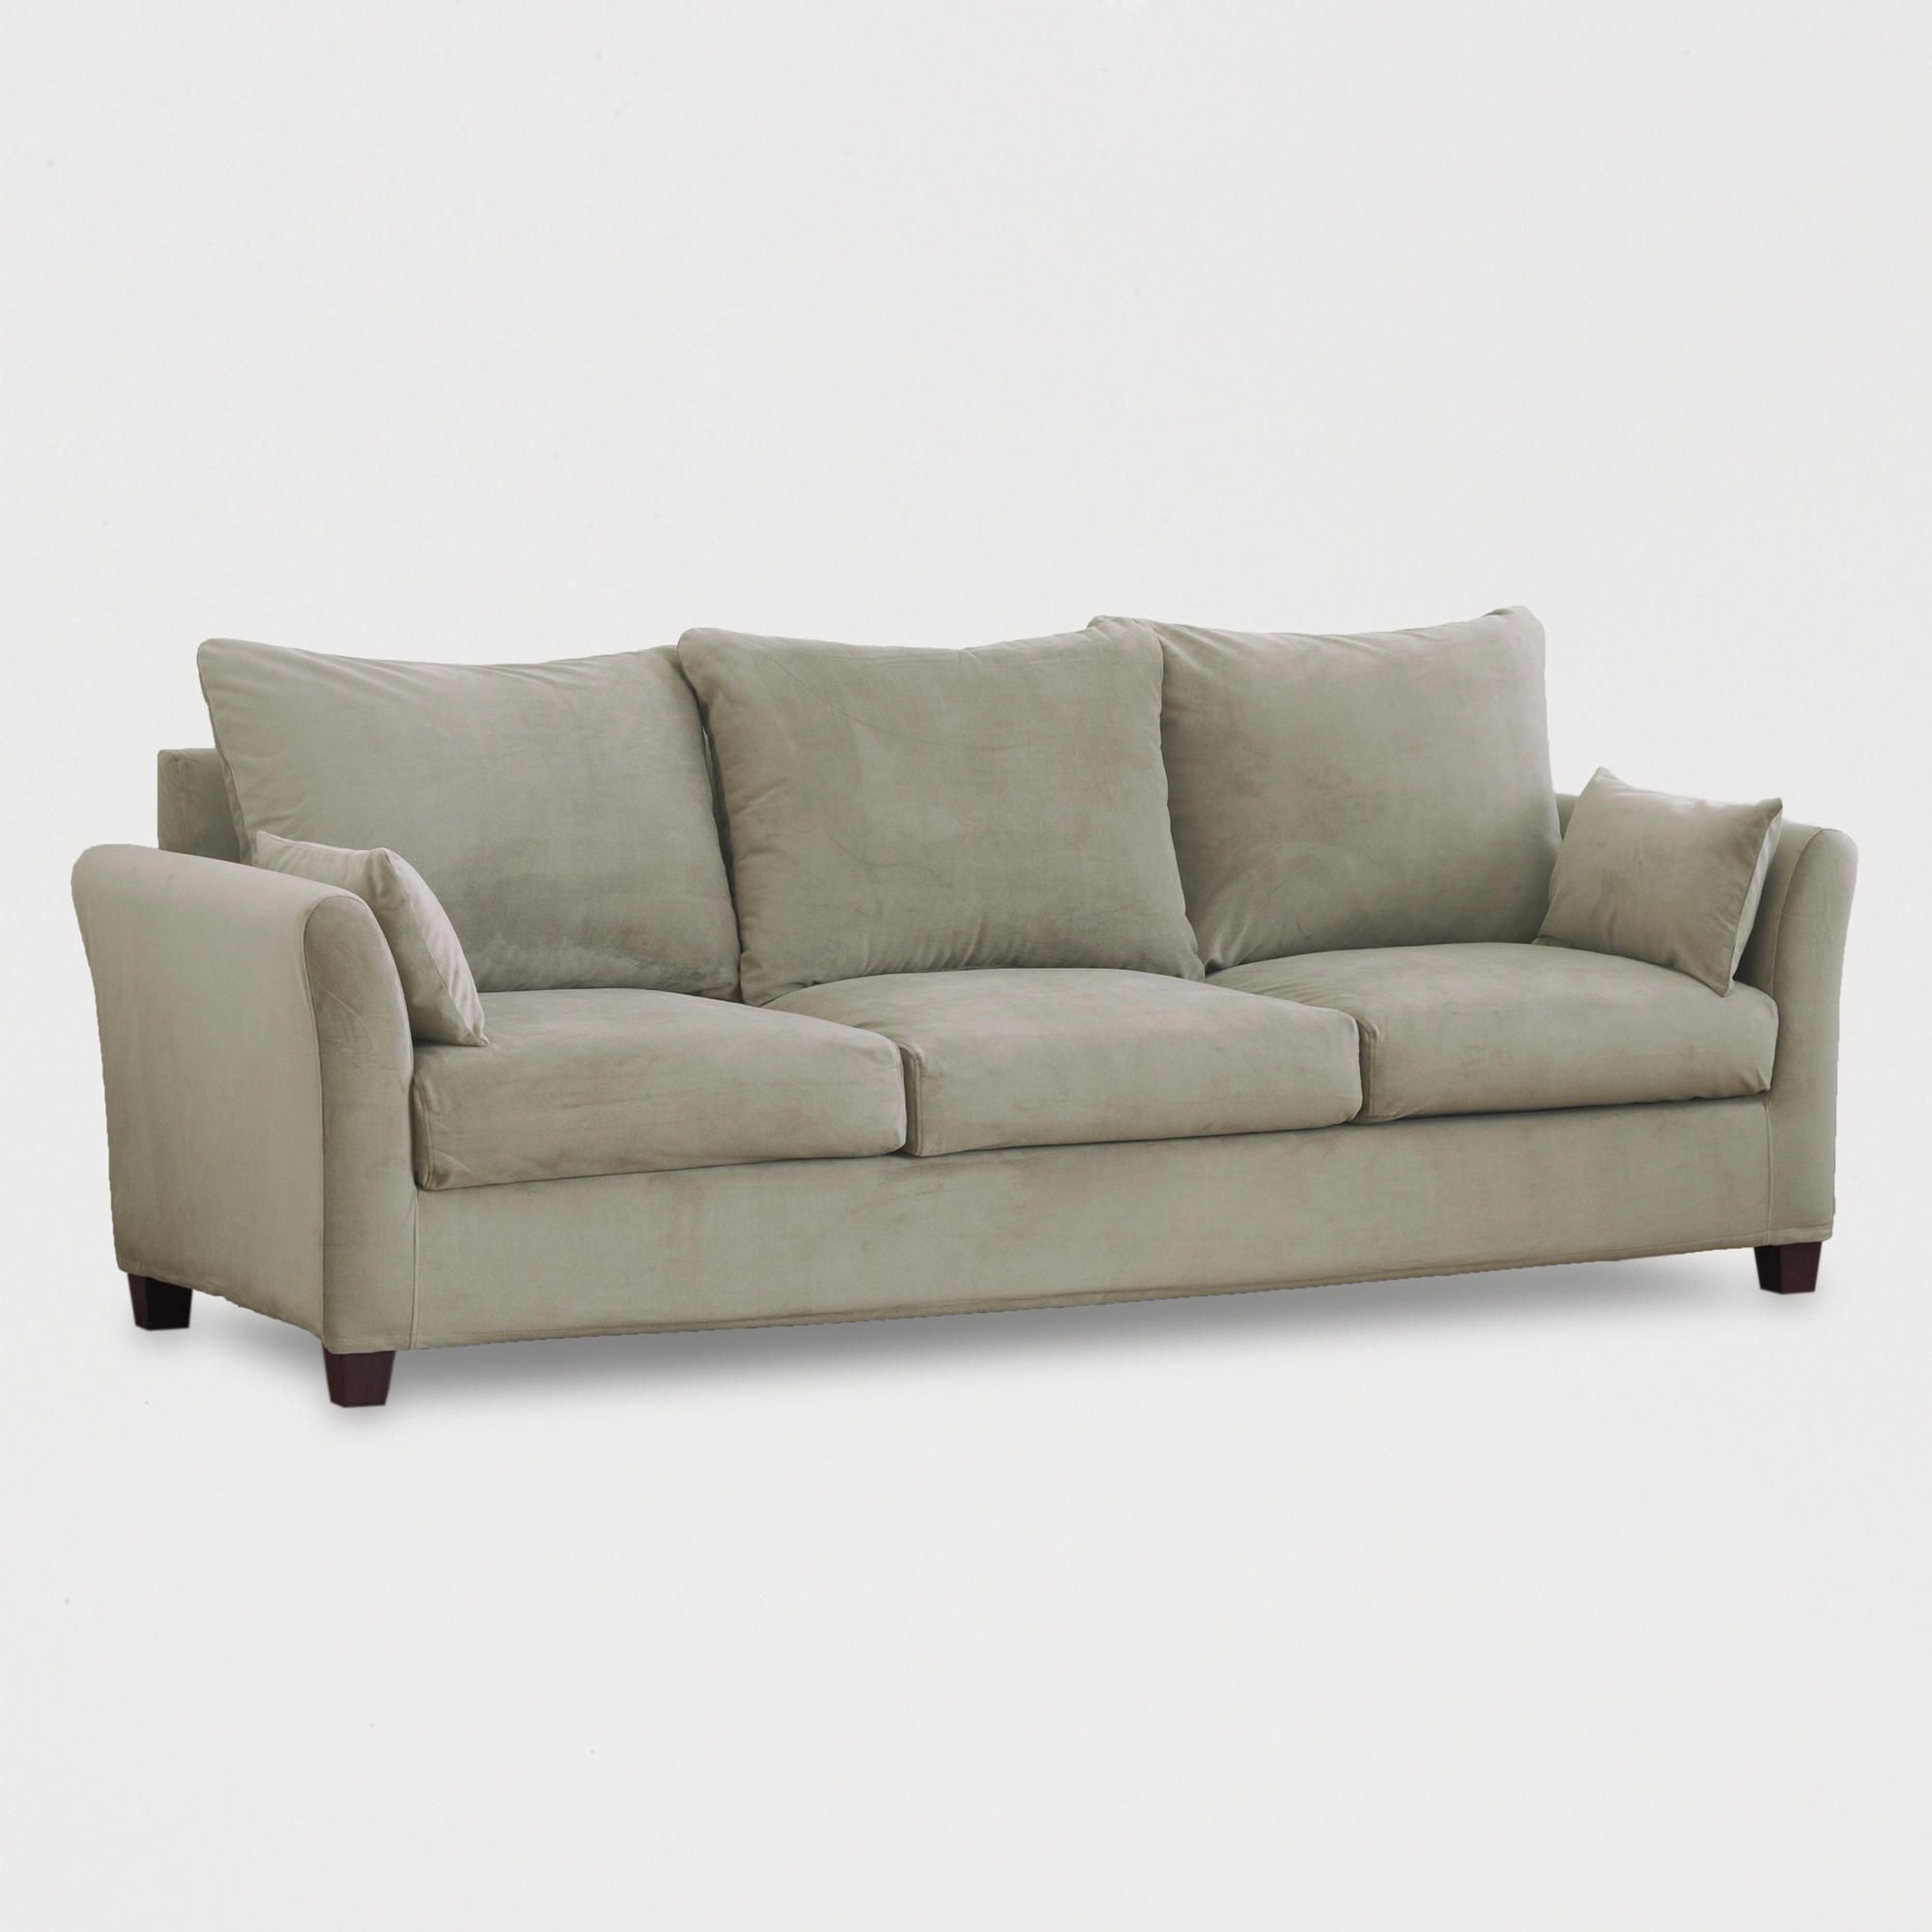 luxe 2 seat sofa slipcover u shaped designs world market 3 www